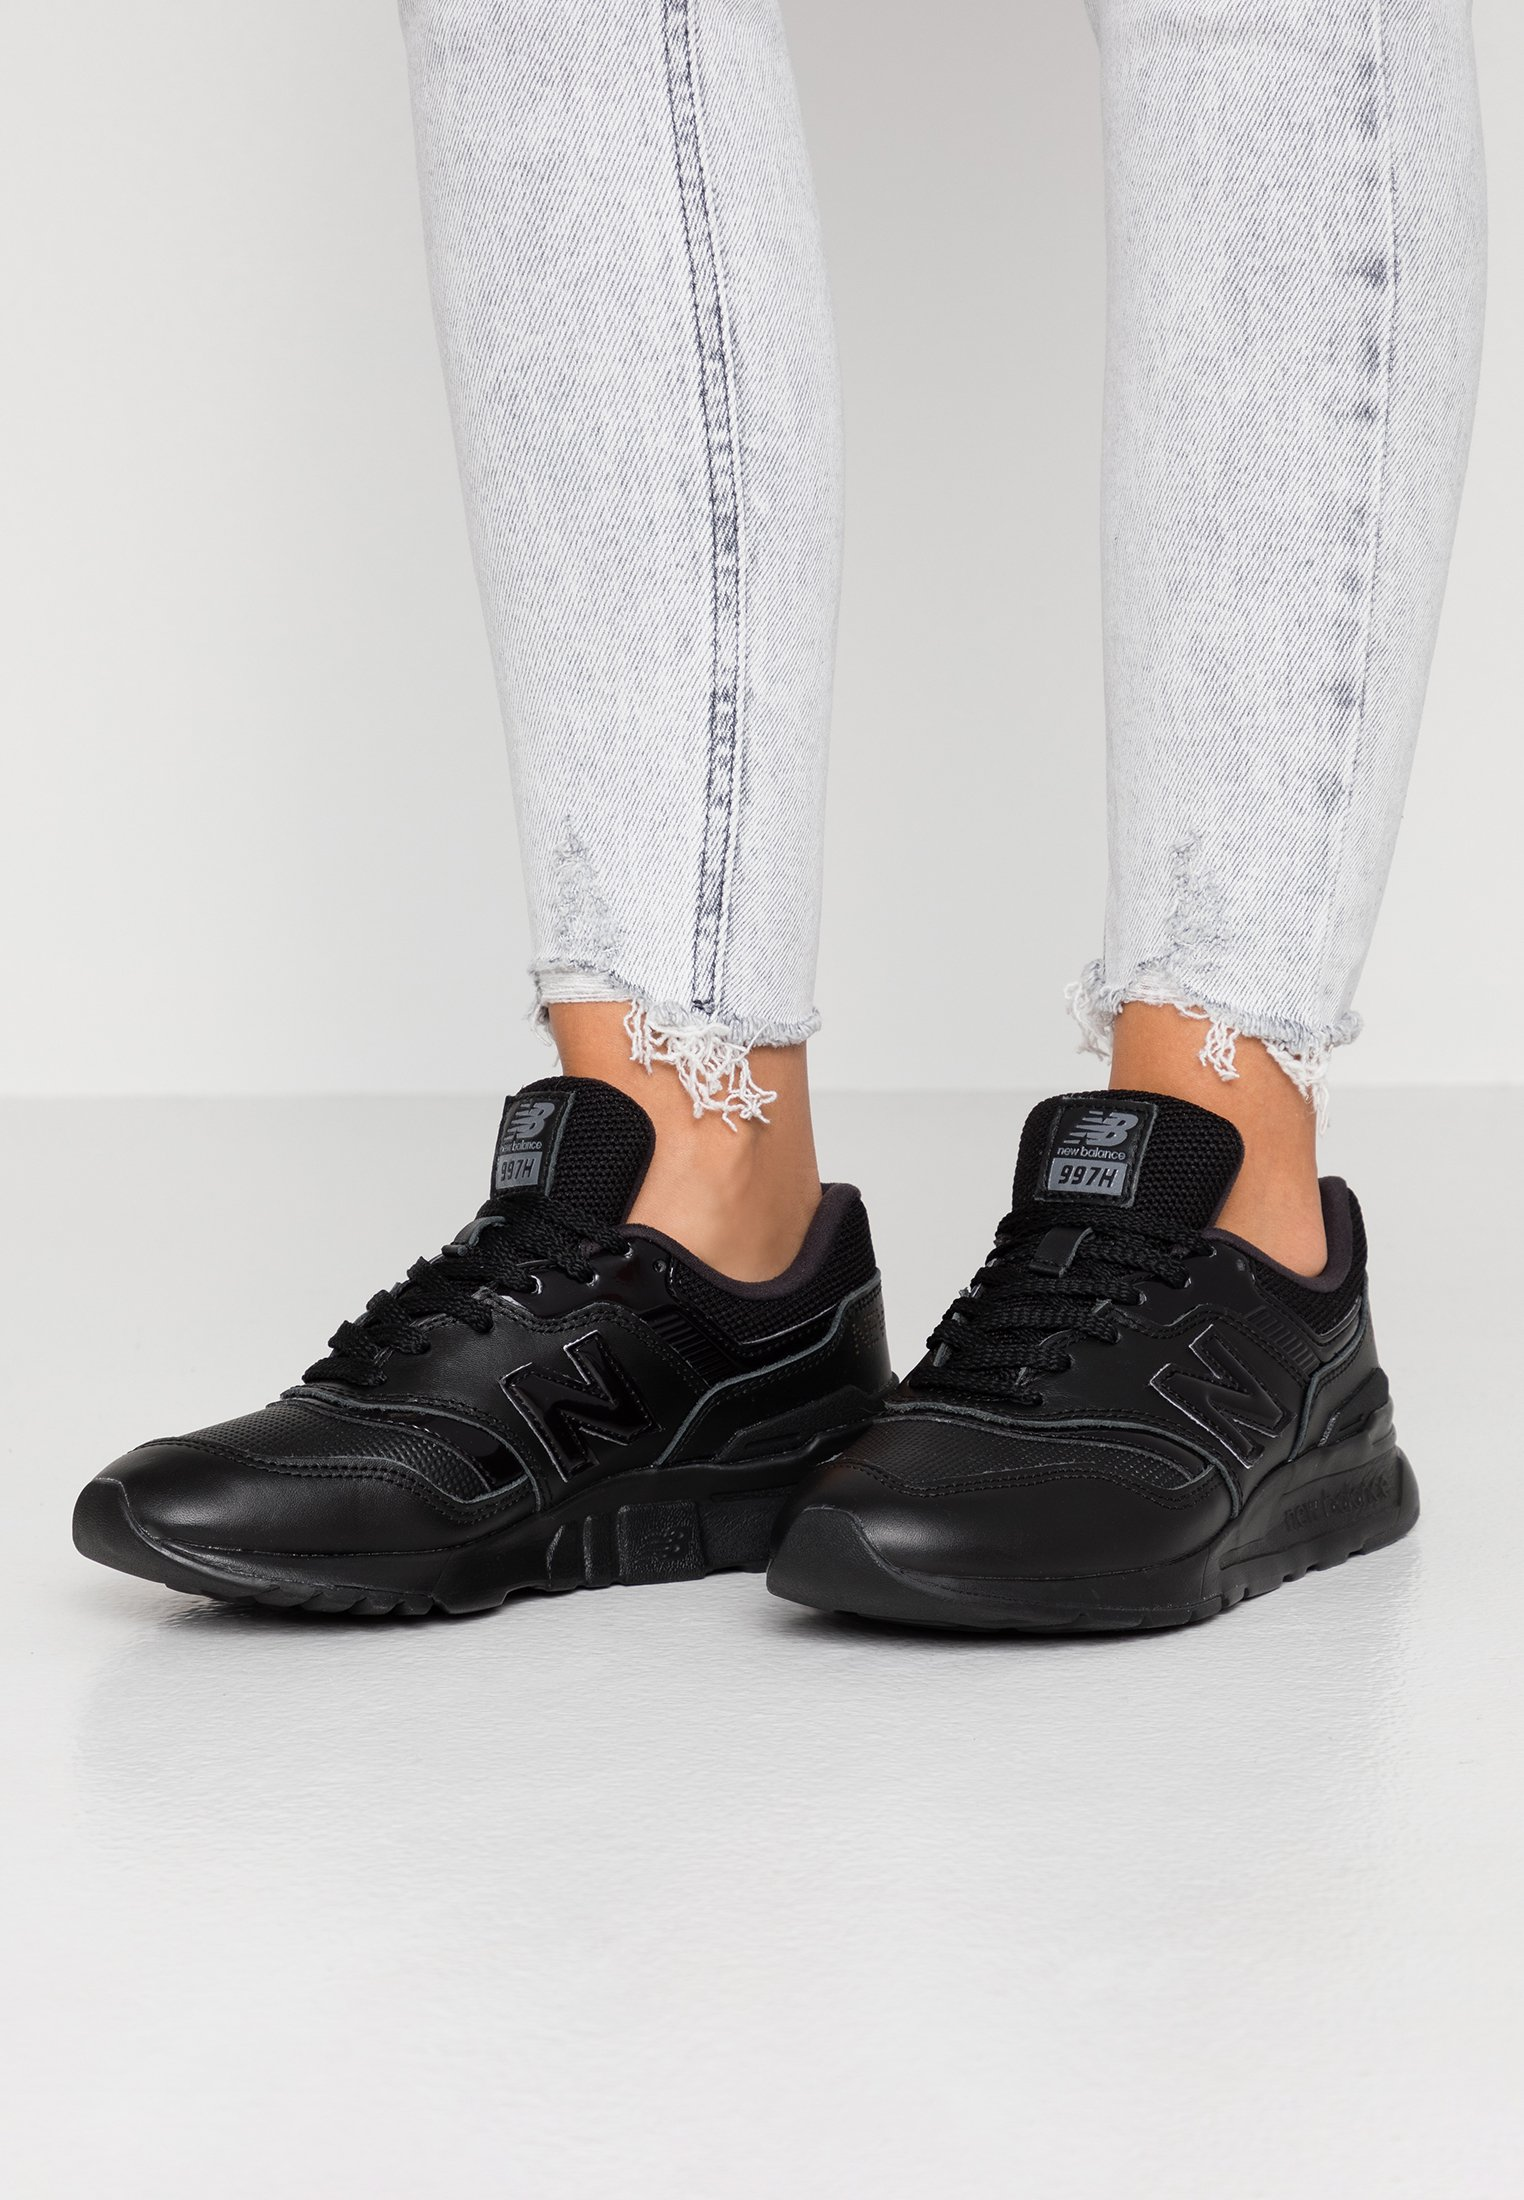 New Balance Baskets basses - black/noir - ZALANDO.FR